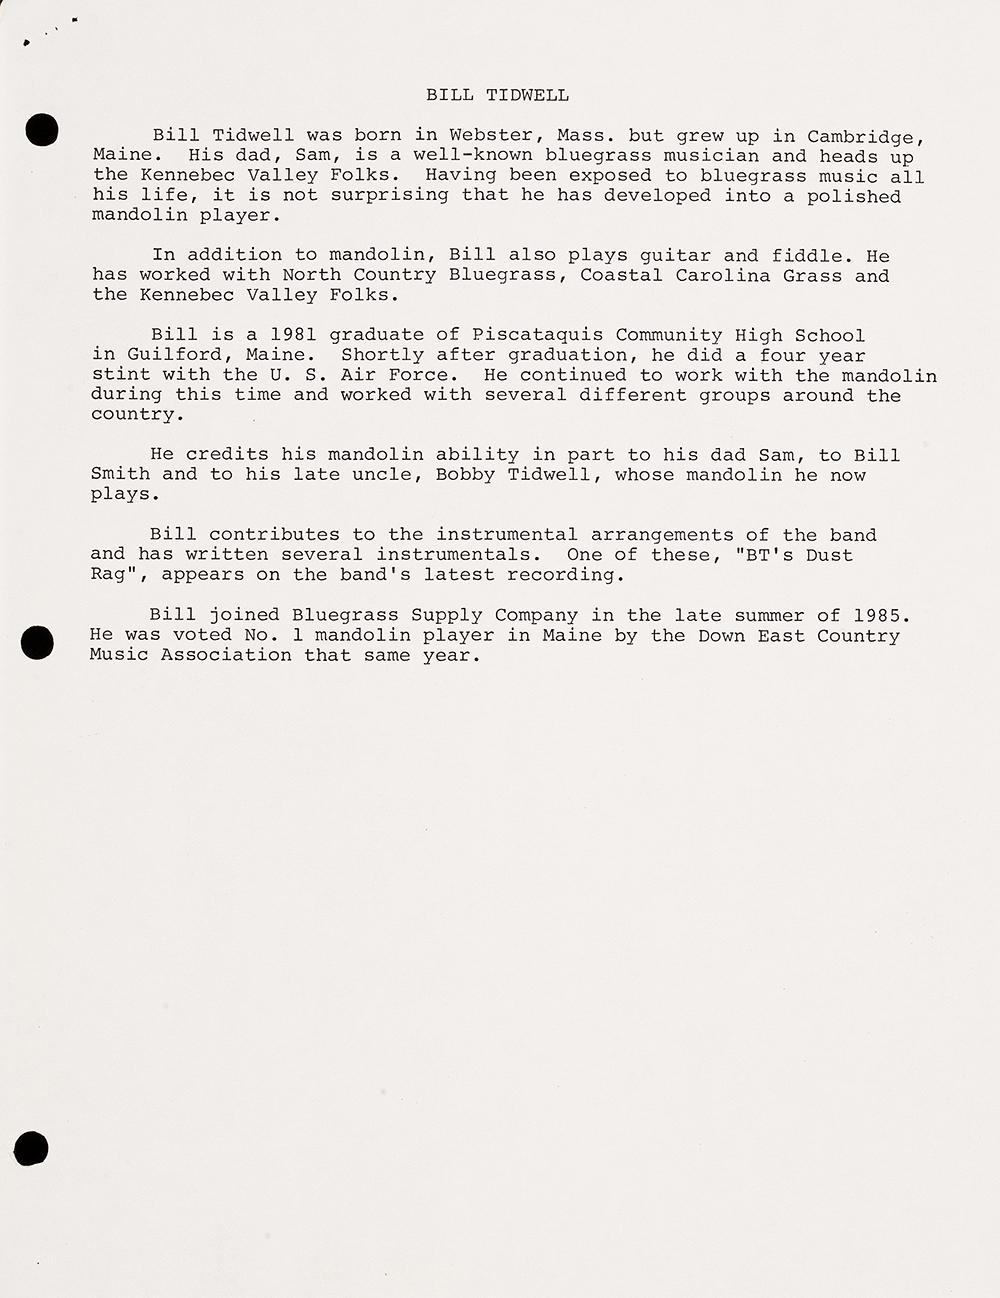 BIOG-1023, Bill Tidwell (Thibodeau), circa 1987